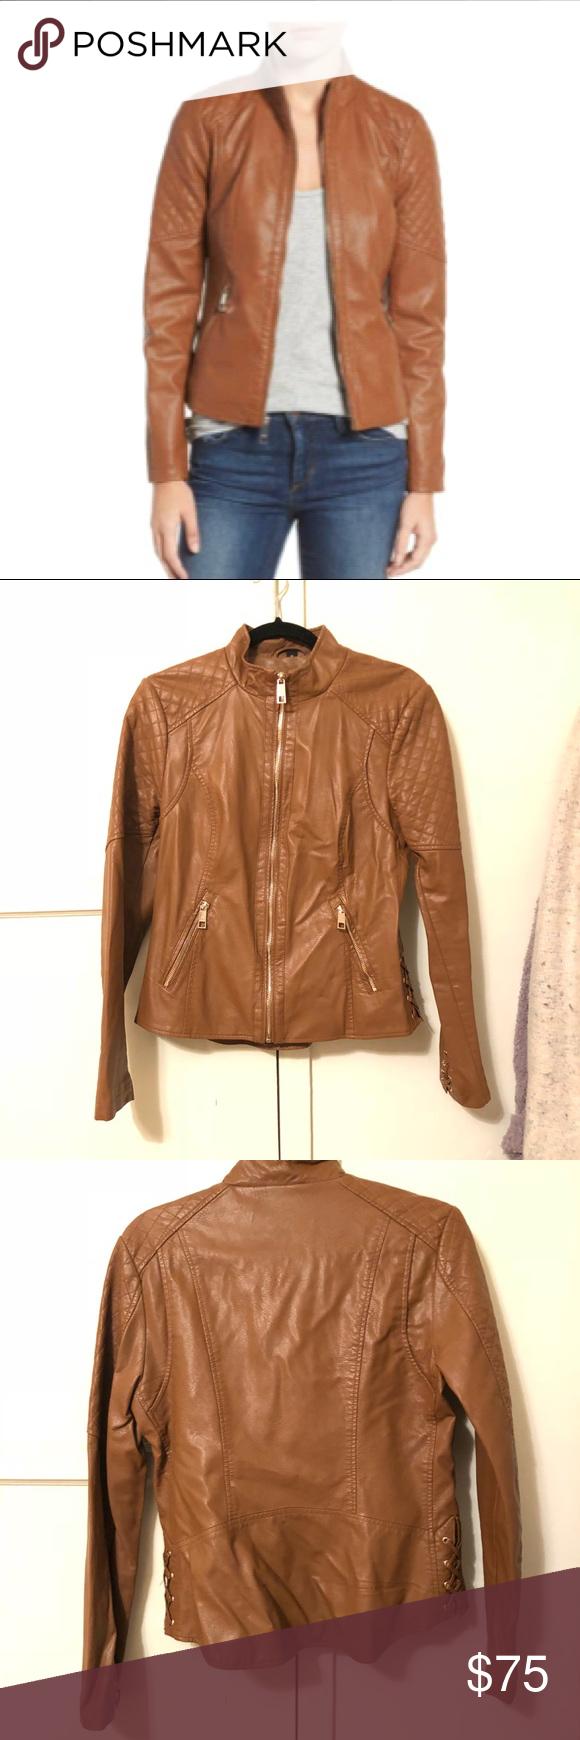 Guess Faux Leather Jacket Leather Jacket Faux Leather Jackets Jackets [ 1740 x 580 Pixel ]